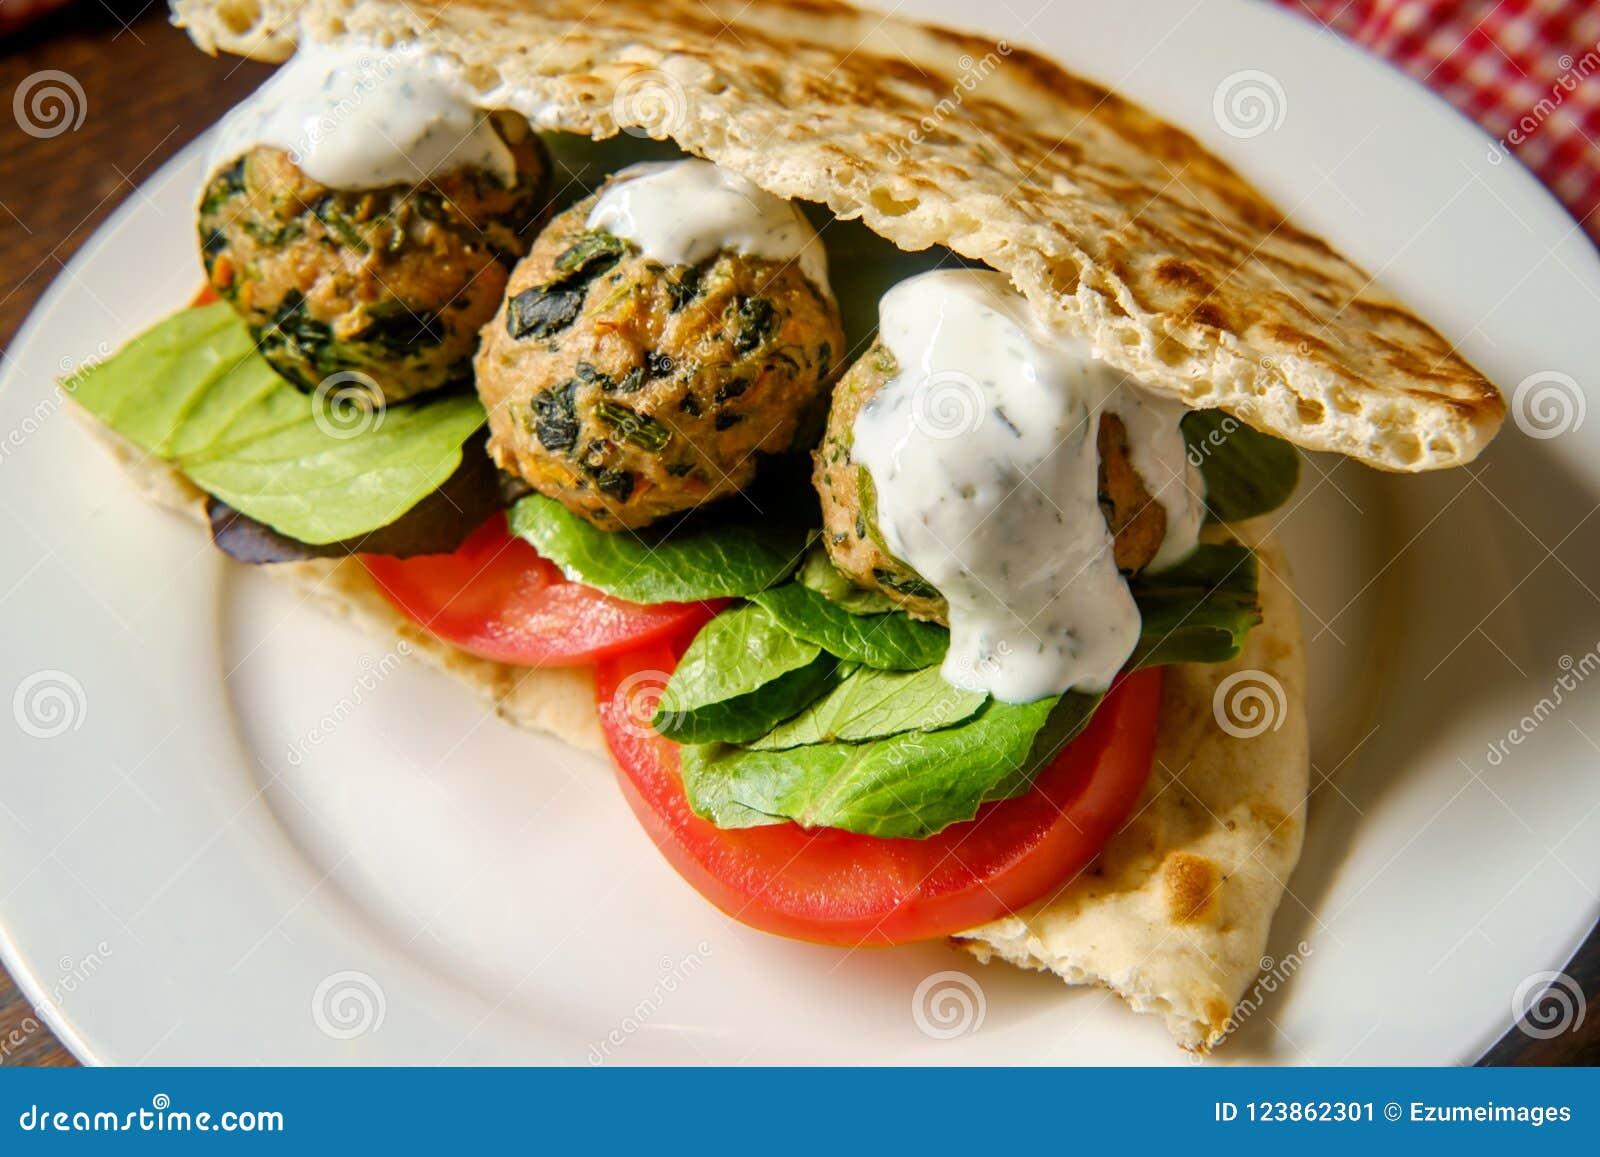 95b256219b0050 Mediterranean turkey meatball sandwich on pita bread with dill yogurt sauce